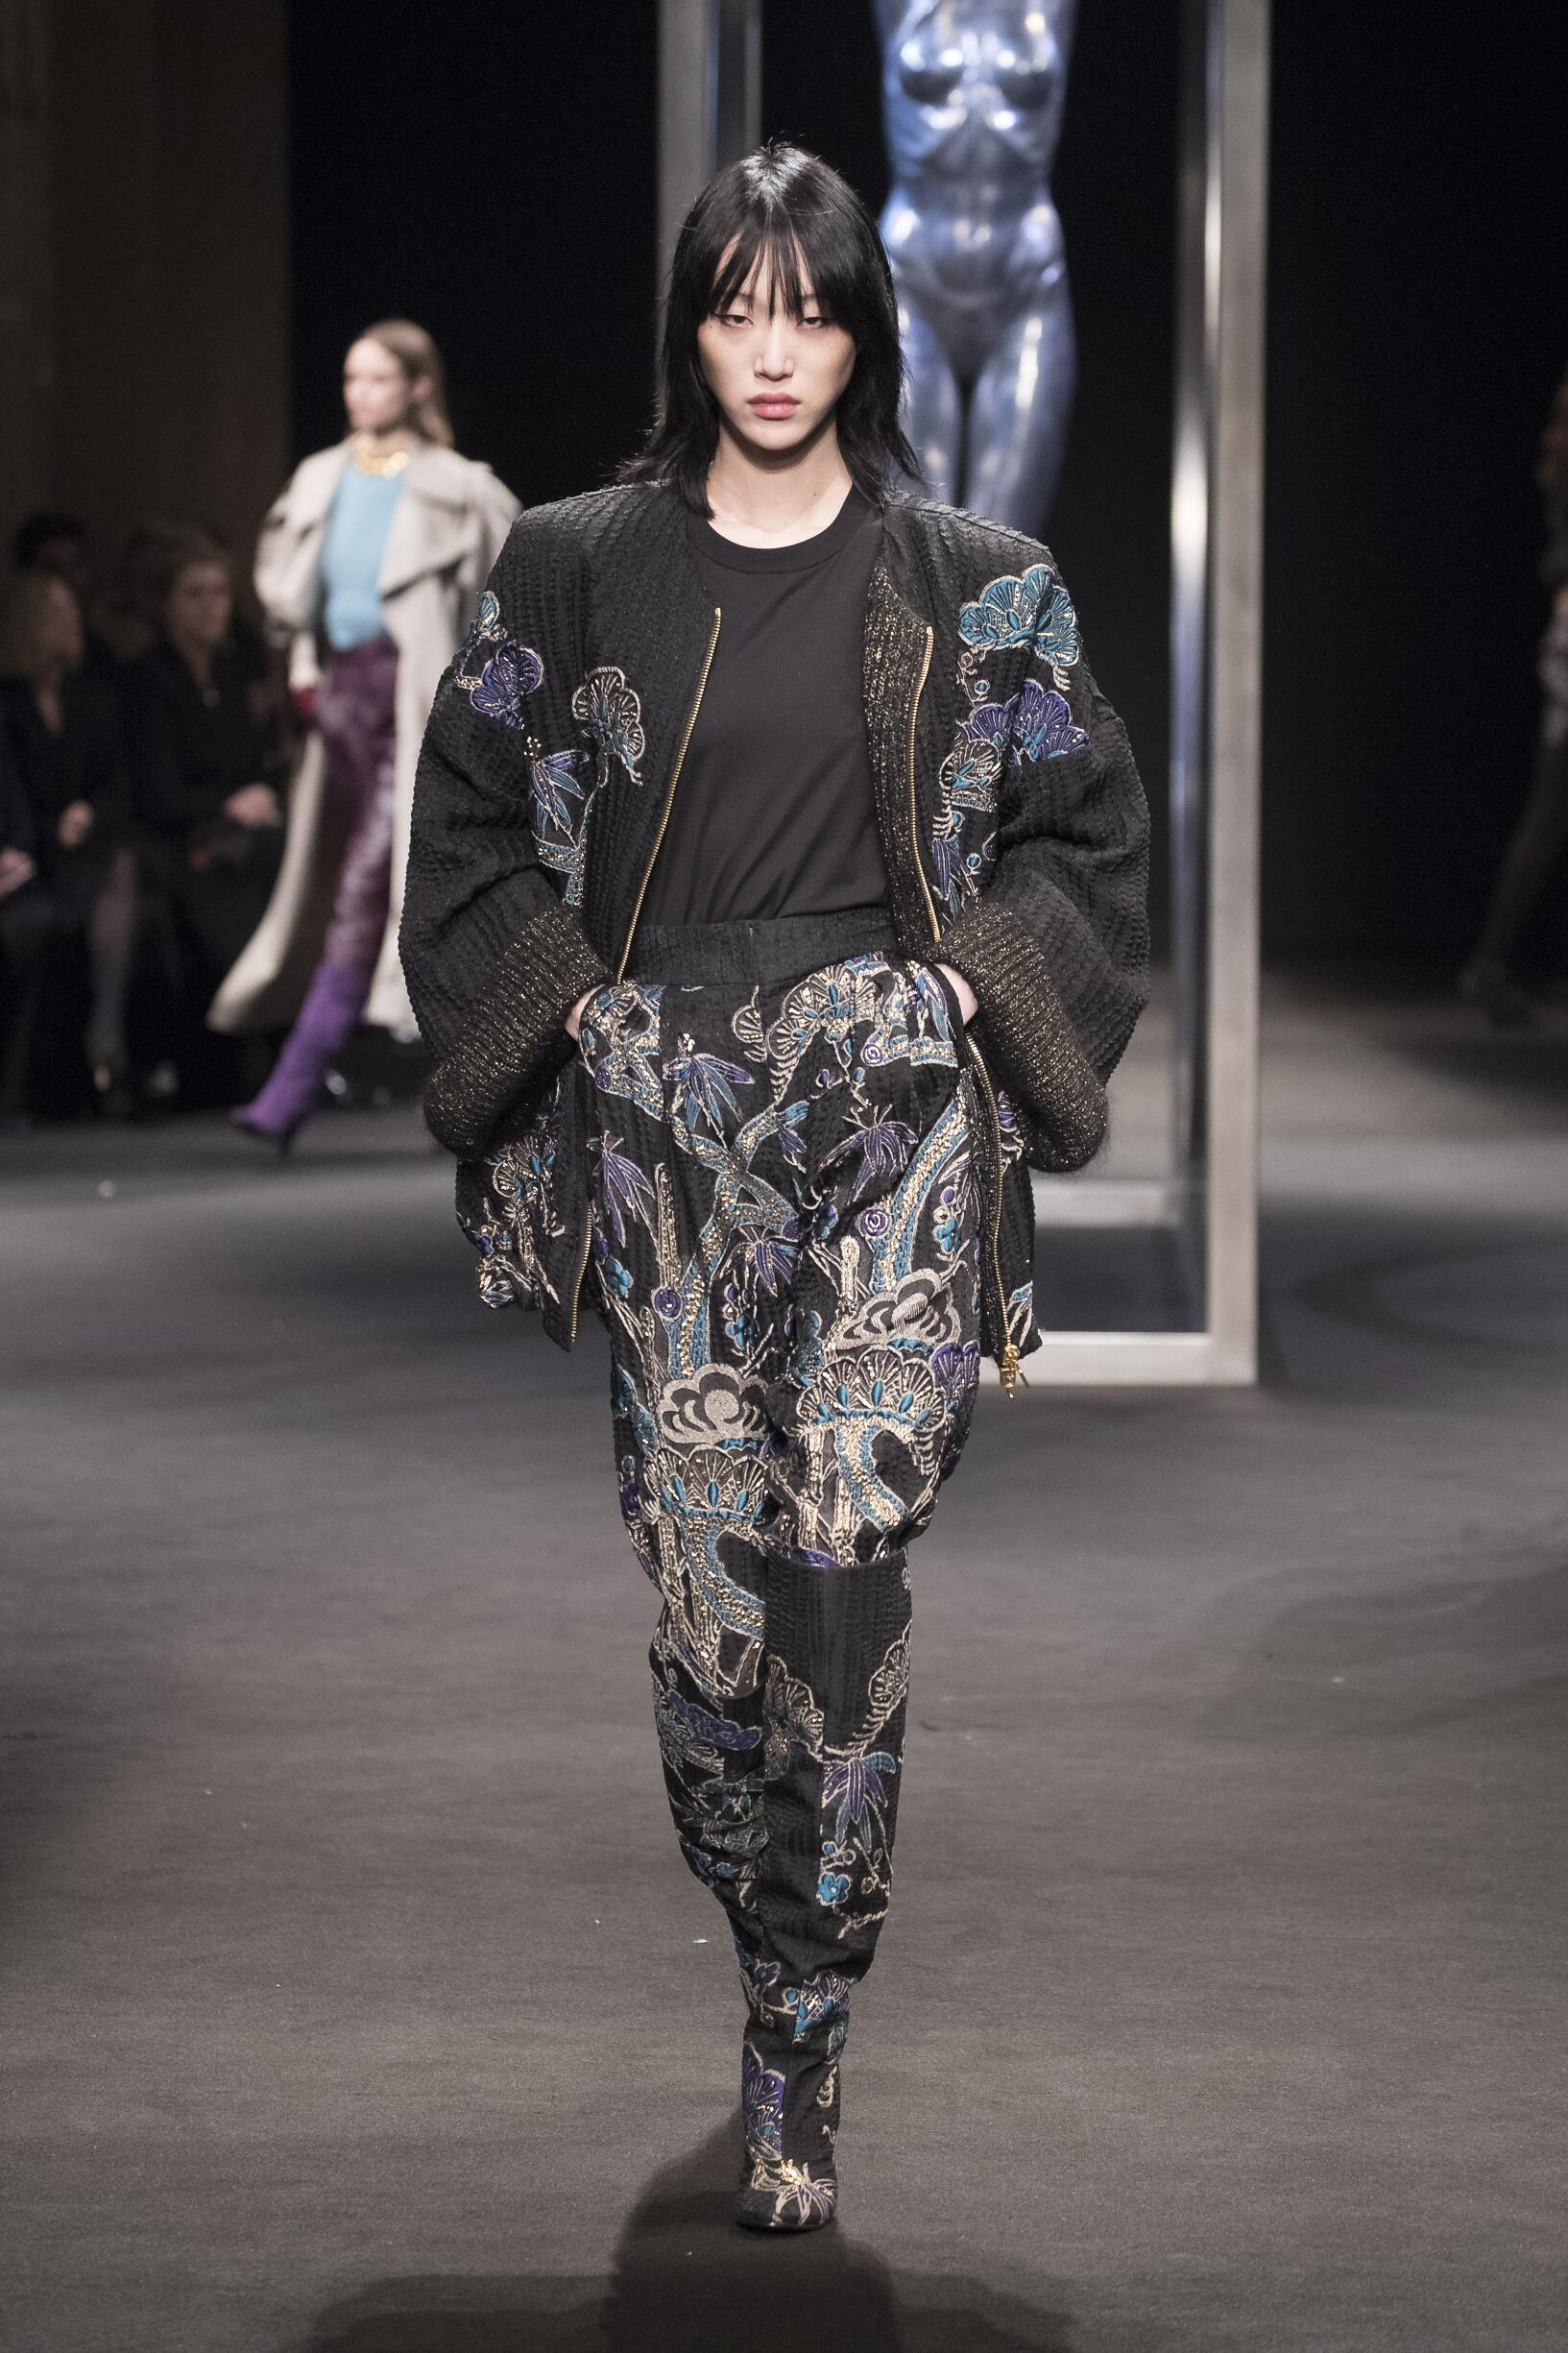 Runway Alberta Ferretti Fall Winter 2018 Women's Collection Milan Fashion Week